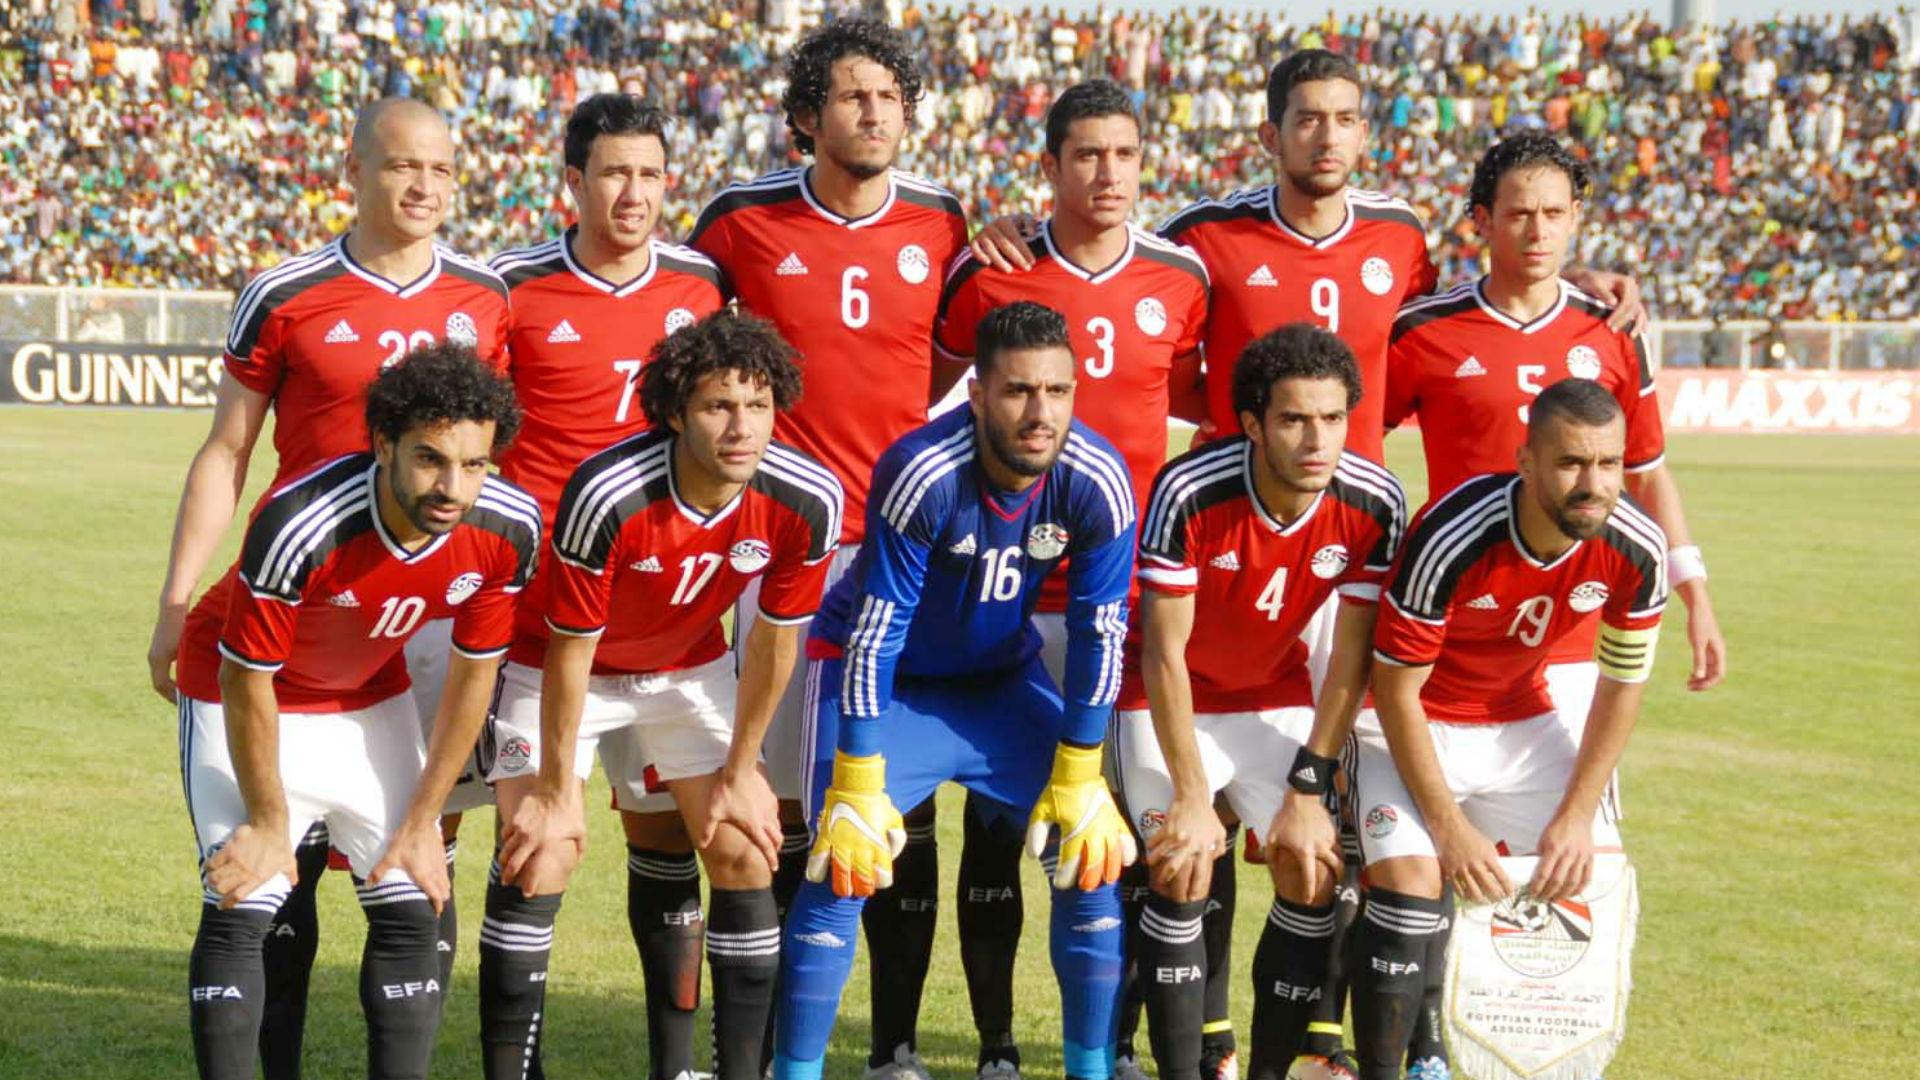 Egypt Football Team Wallpapers